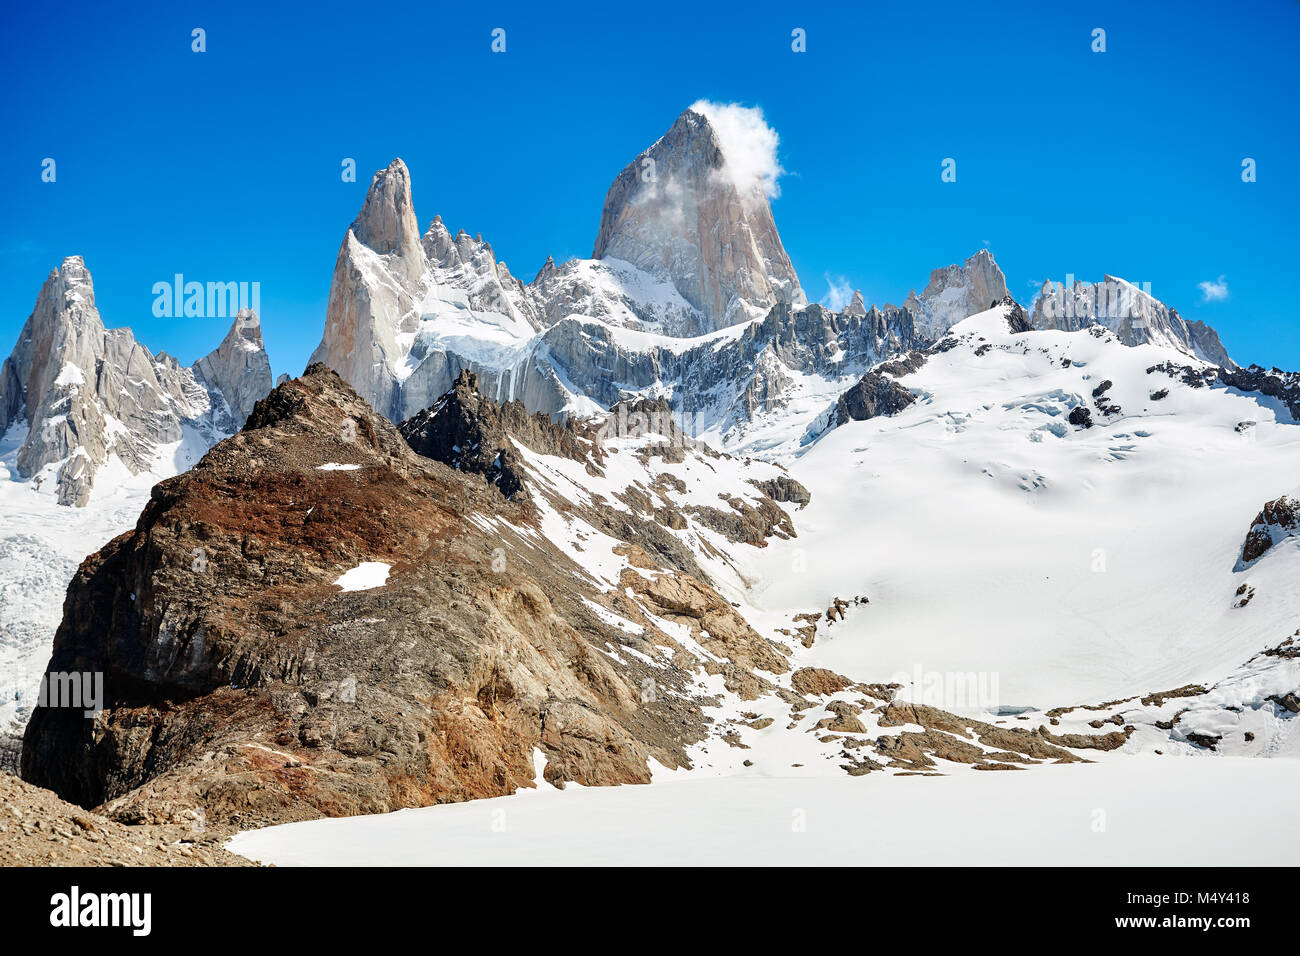 Fitz Roy, le Parc National Los Glaciares, en Argentine. Photo Stock